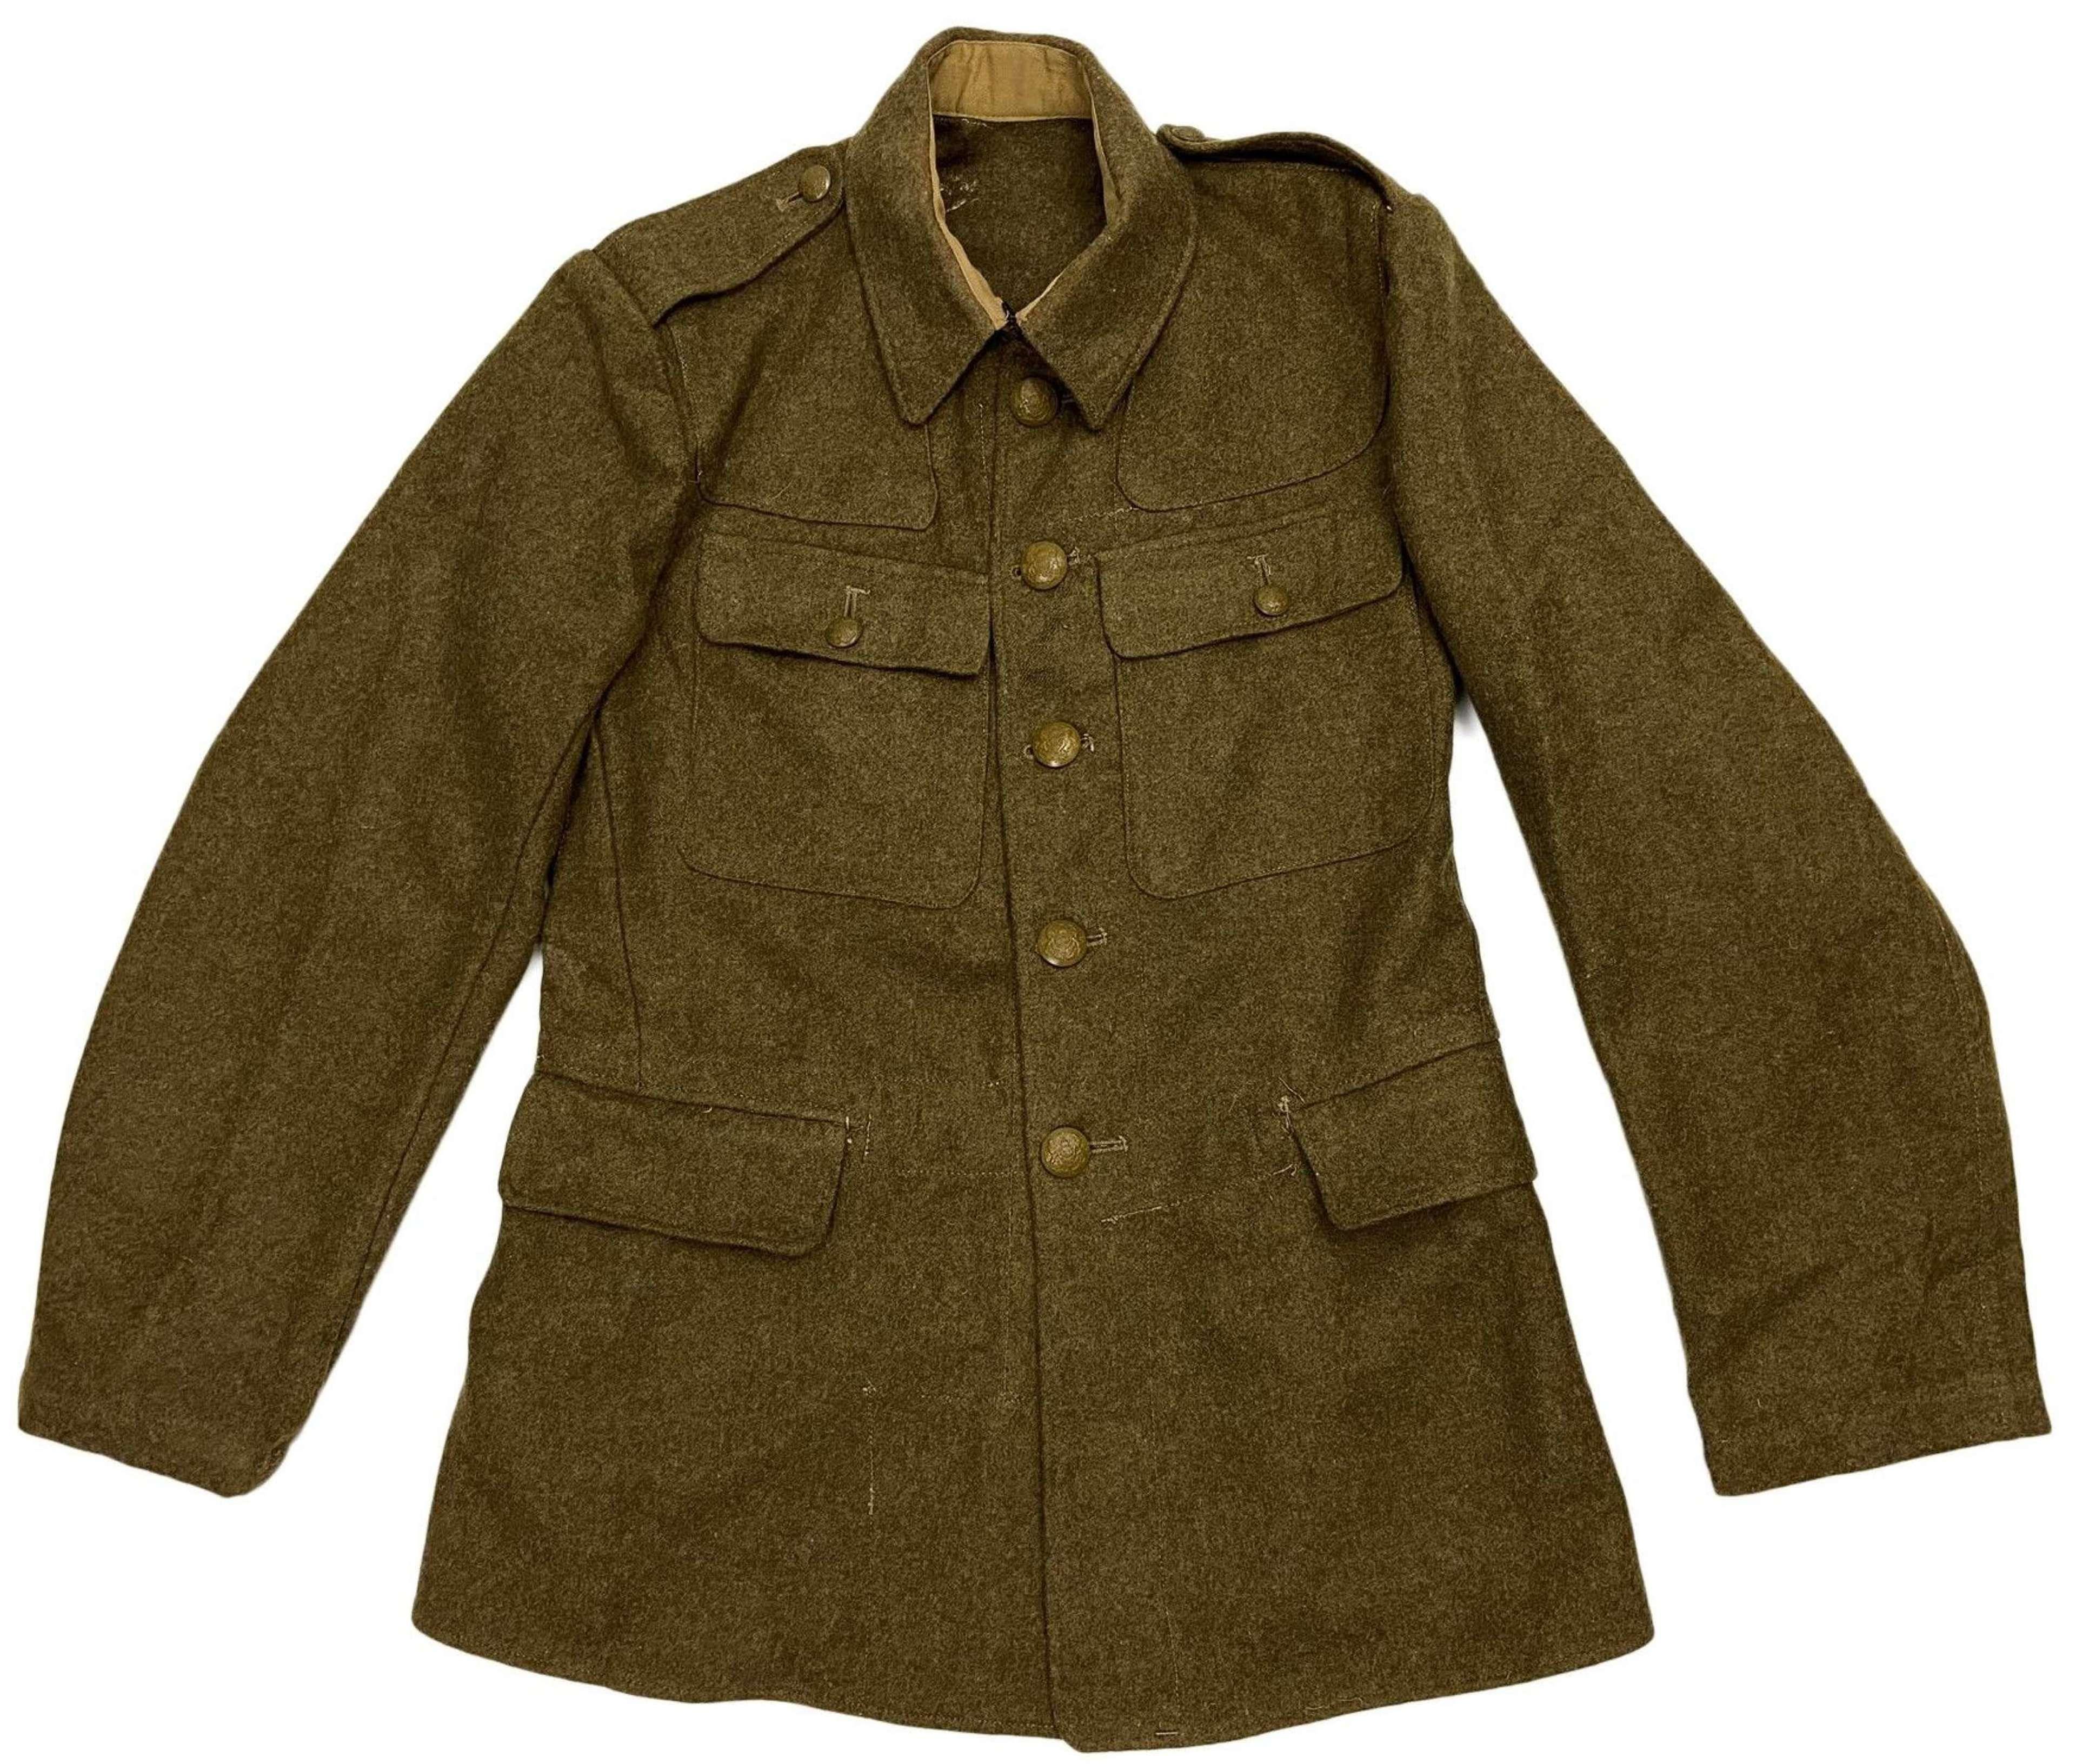 Original 1943 Dated British Army Service Dress Tunic - Size 14